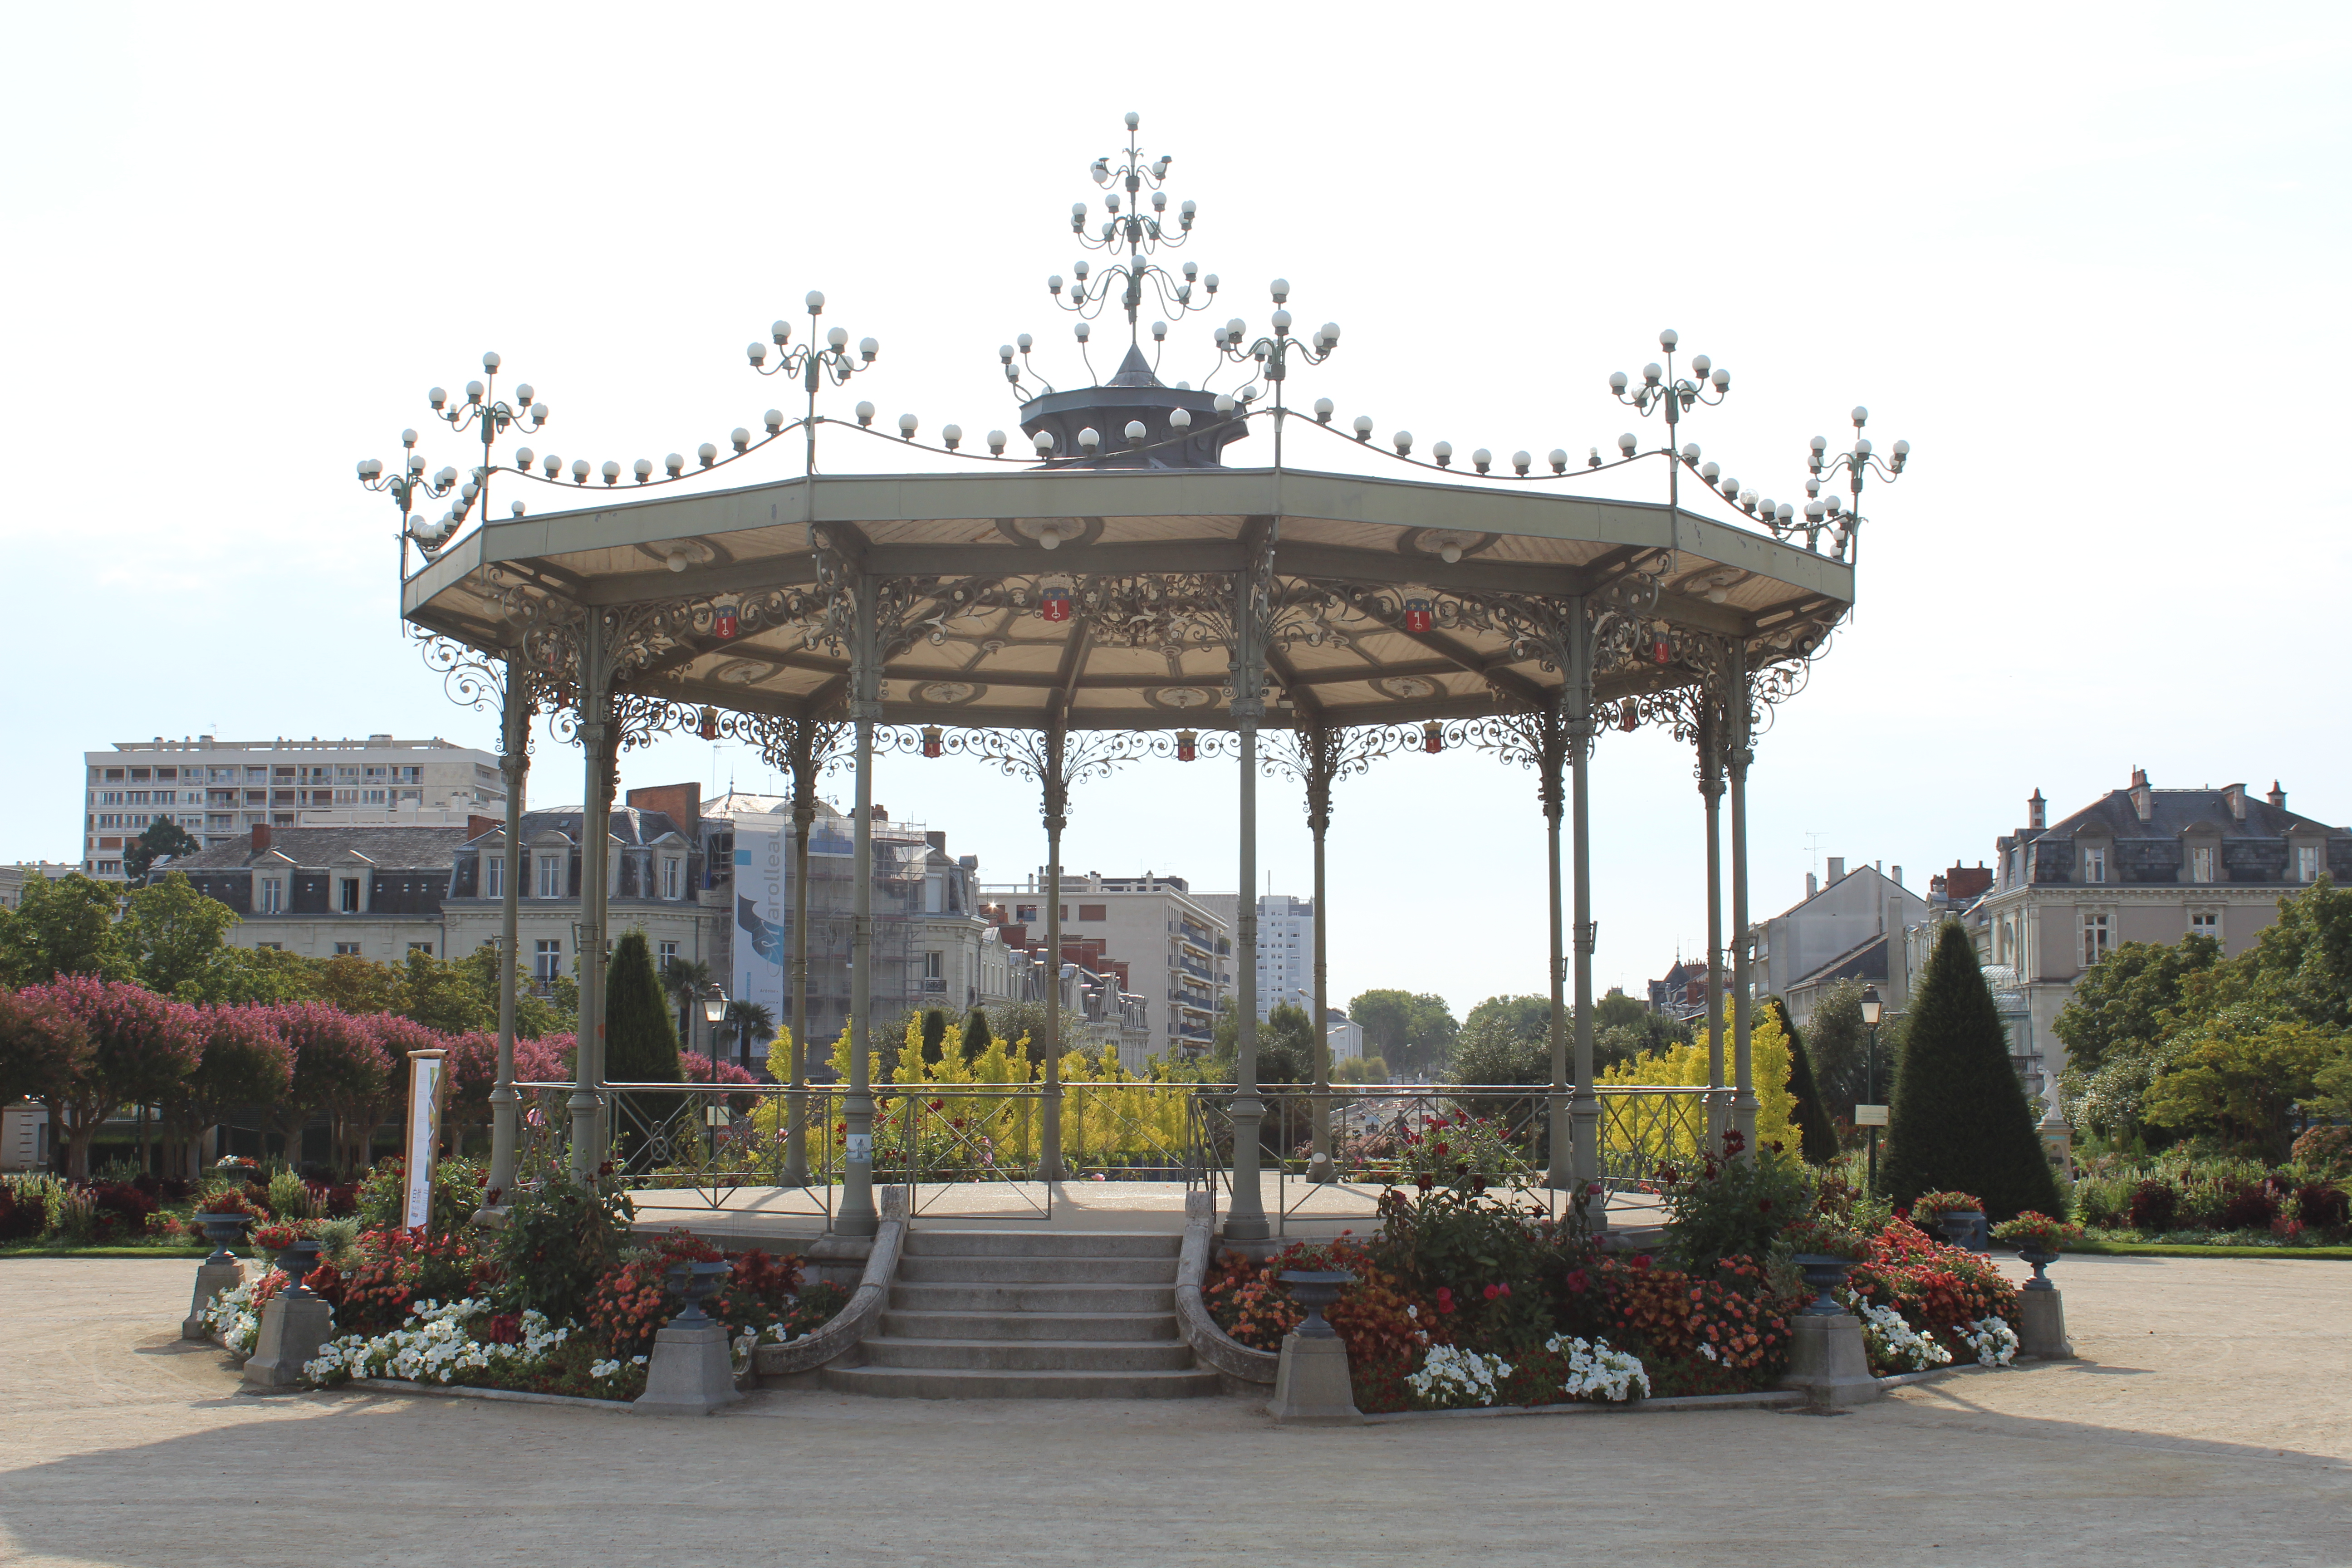 File:Kiosque Jardin Mail Angers 1.jpg - Wikimedia Commons